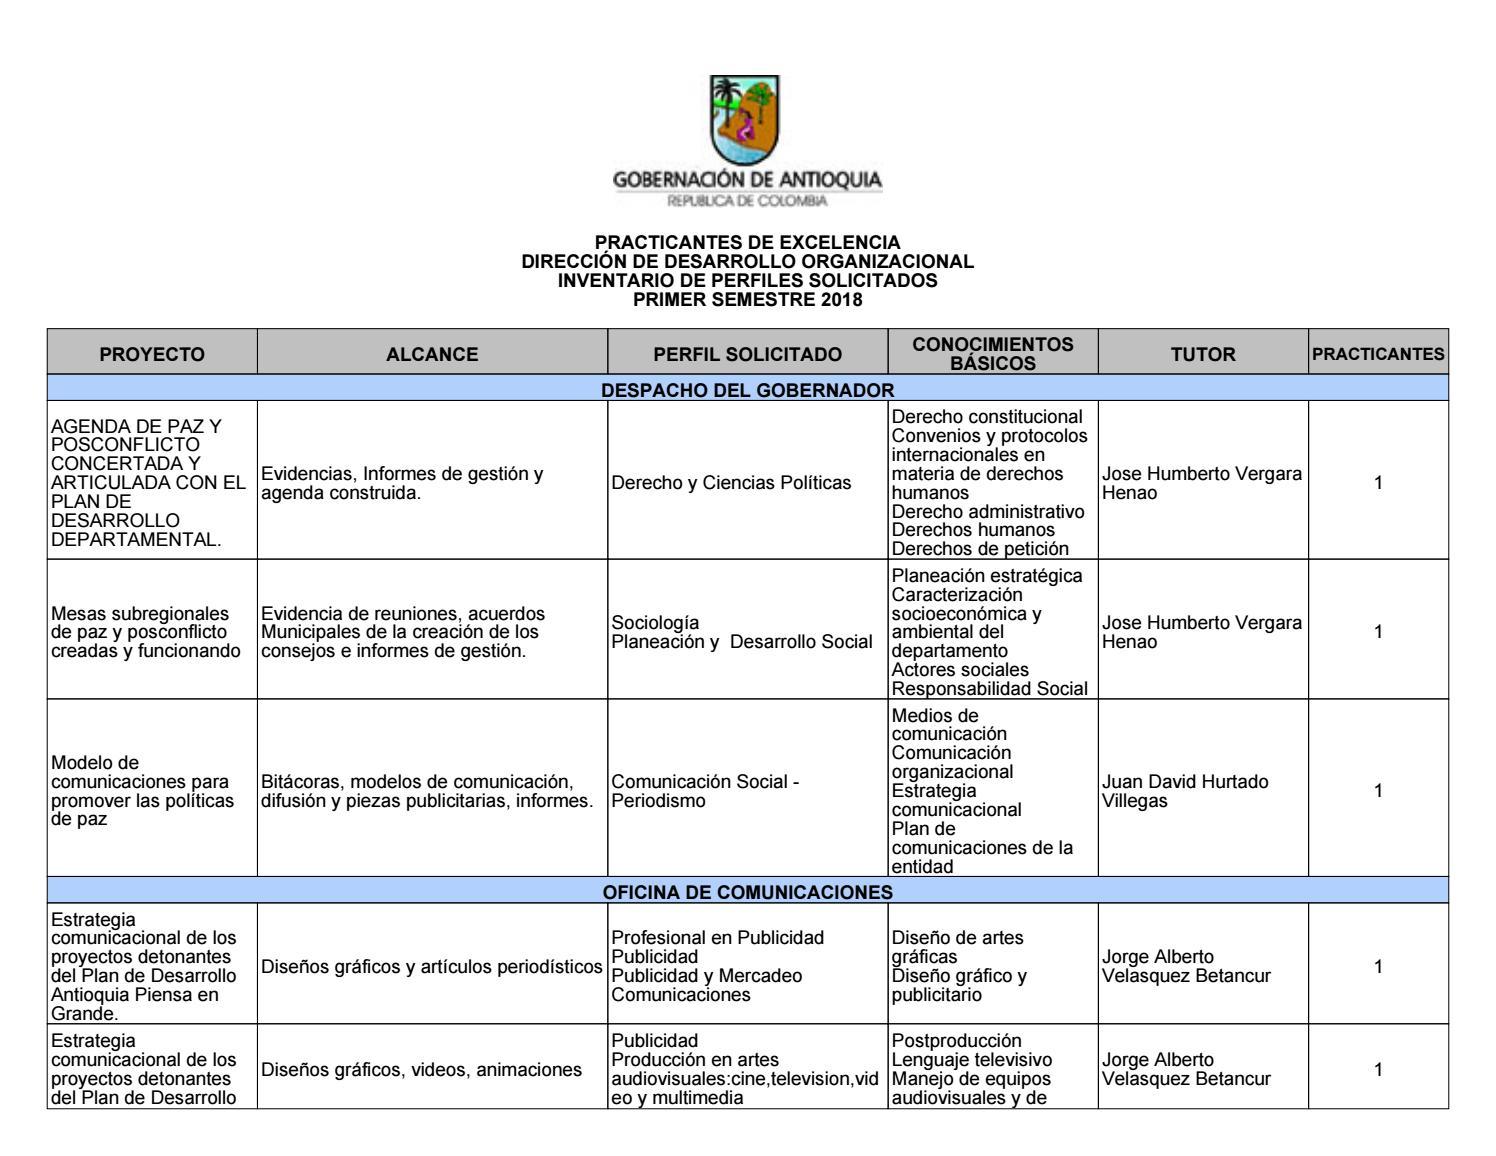 Inventario de perfiles I 2018 by Gobernación de Antioquia - issuu